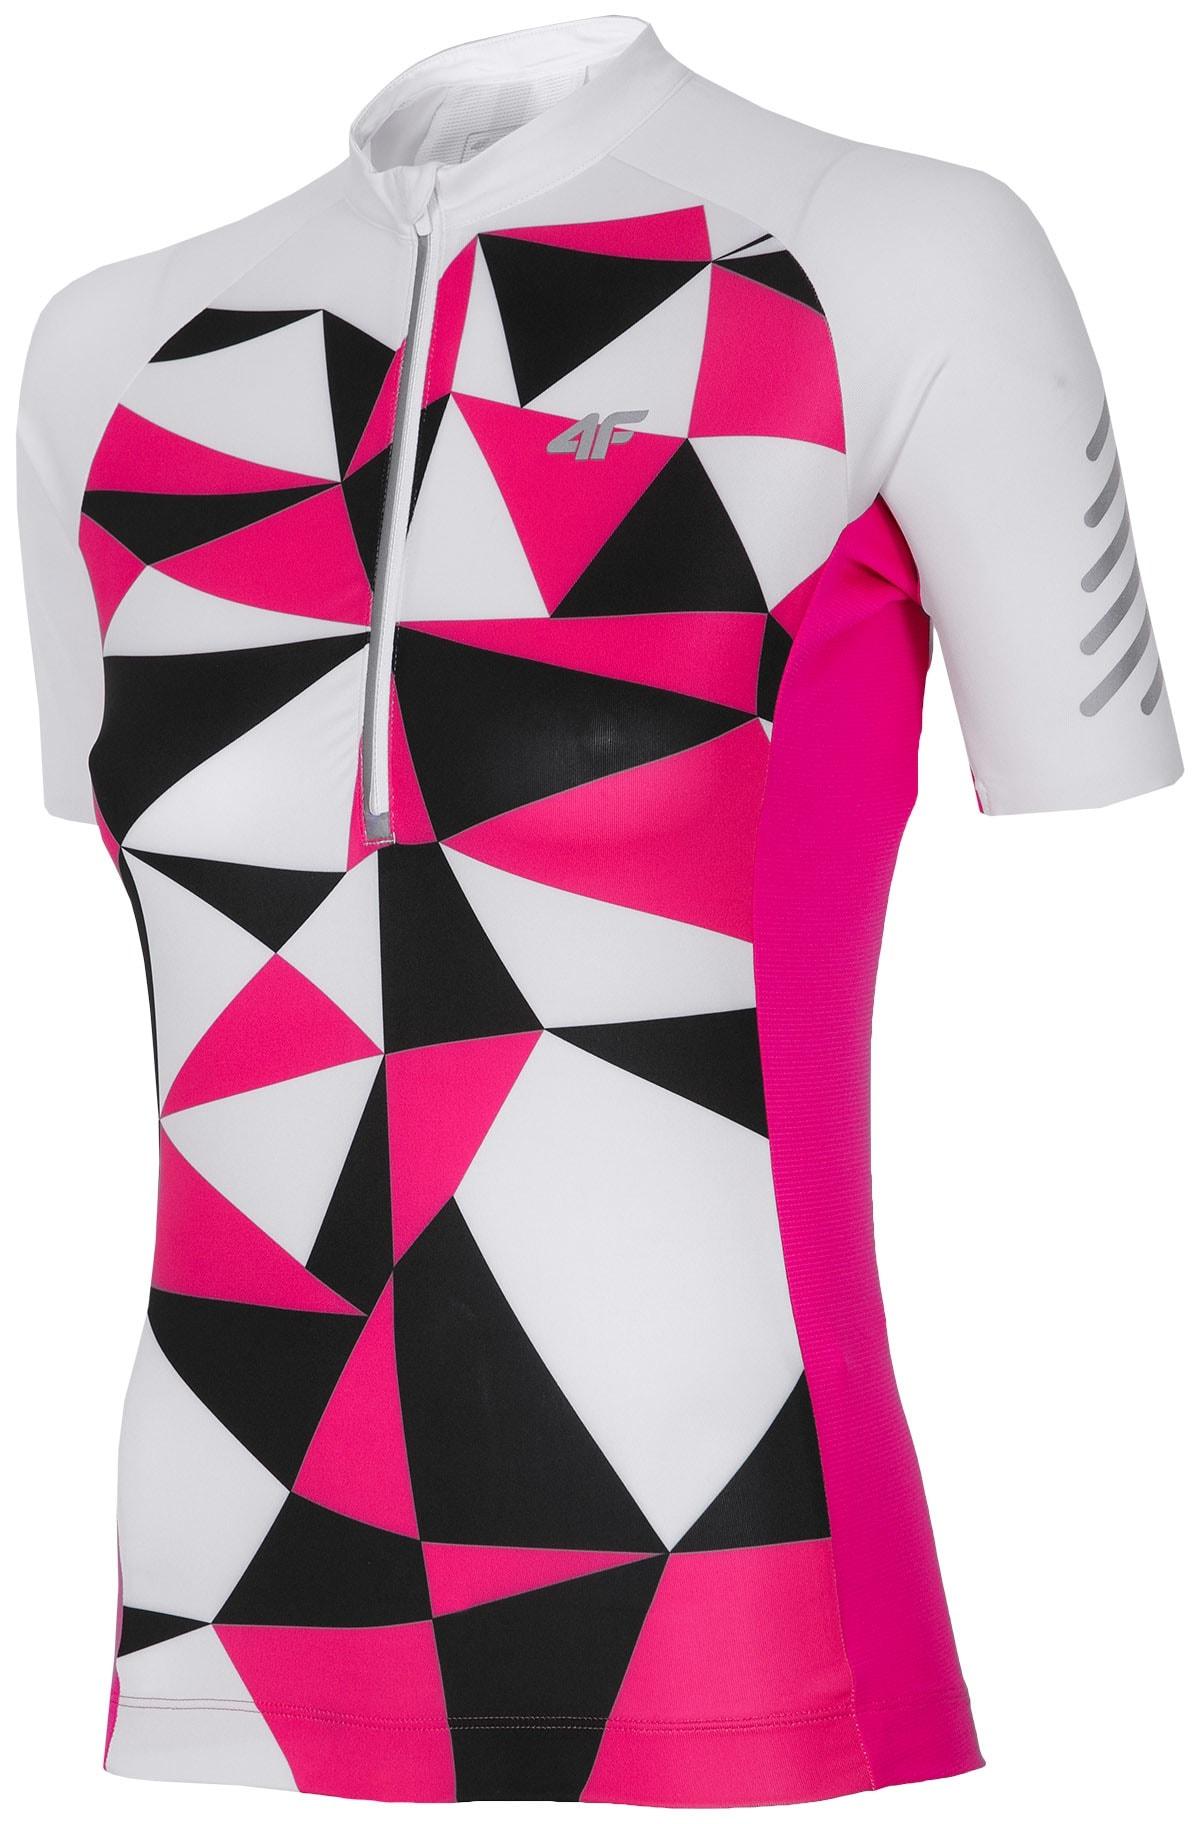 Koszulka rowerowa damska RKD152A - biały